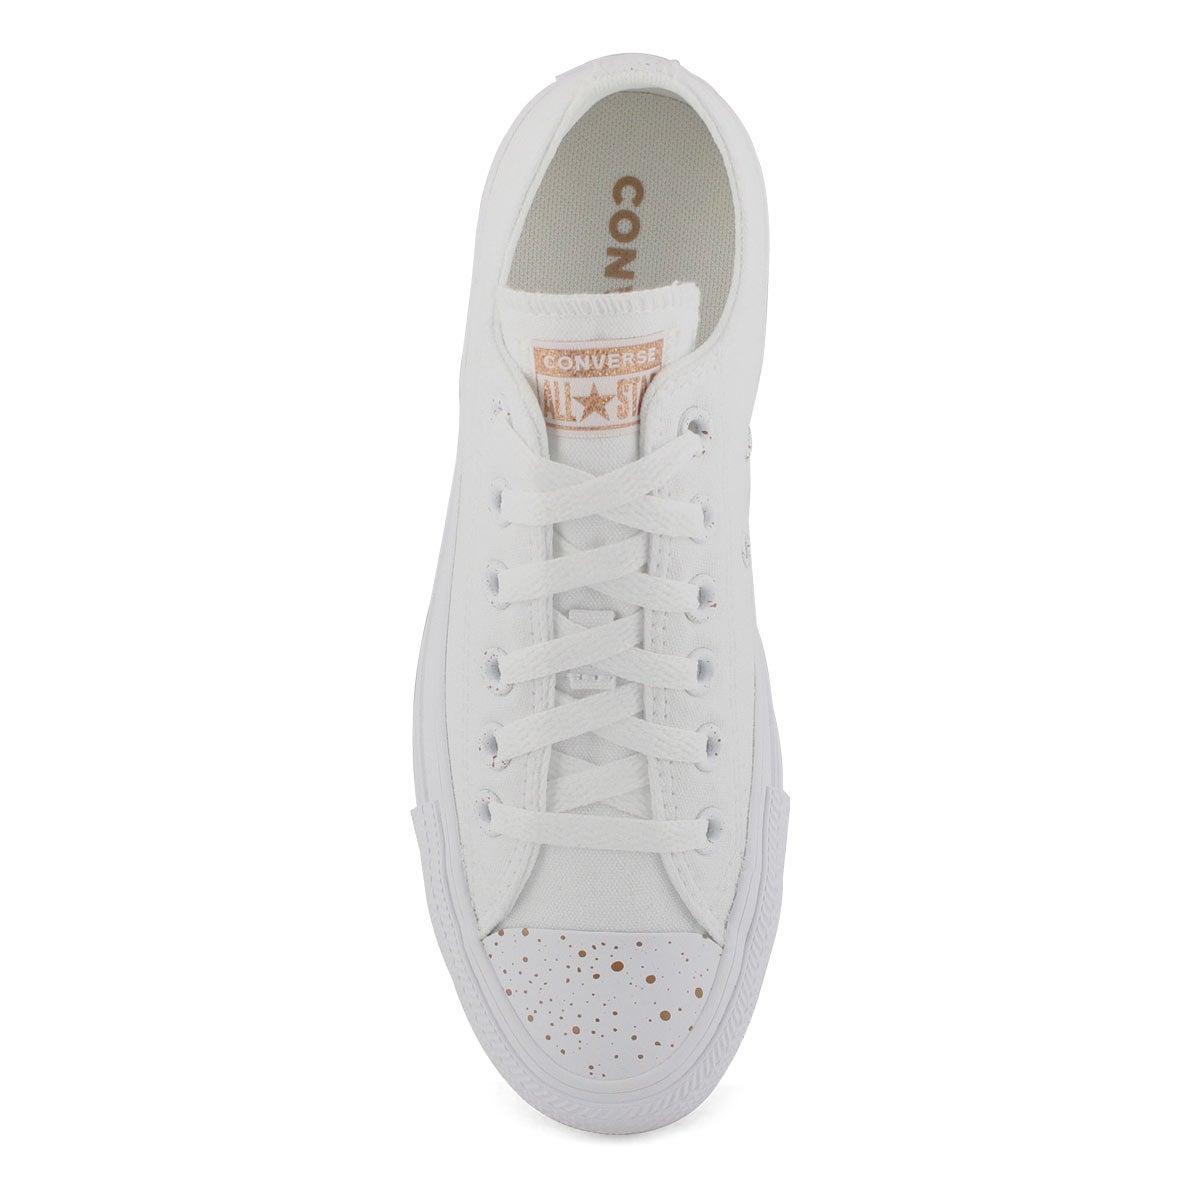 Women's All Star Precious Metals Sneaker - Wht/Wht